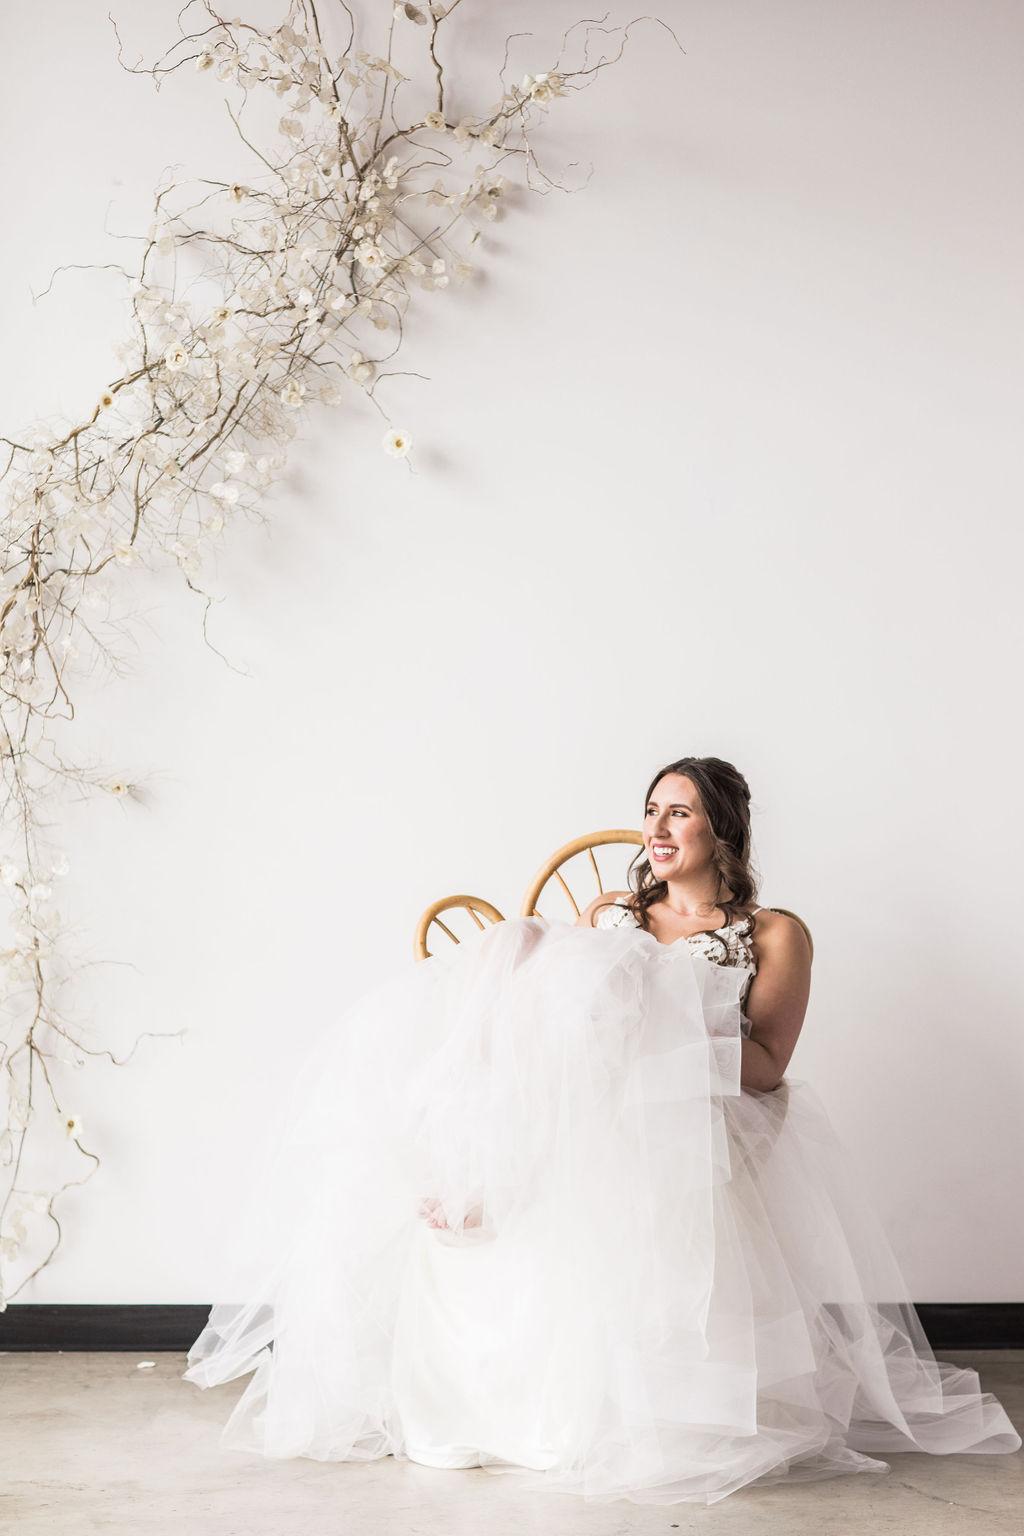 Peacock chair bridal wedding spokane